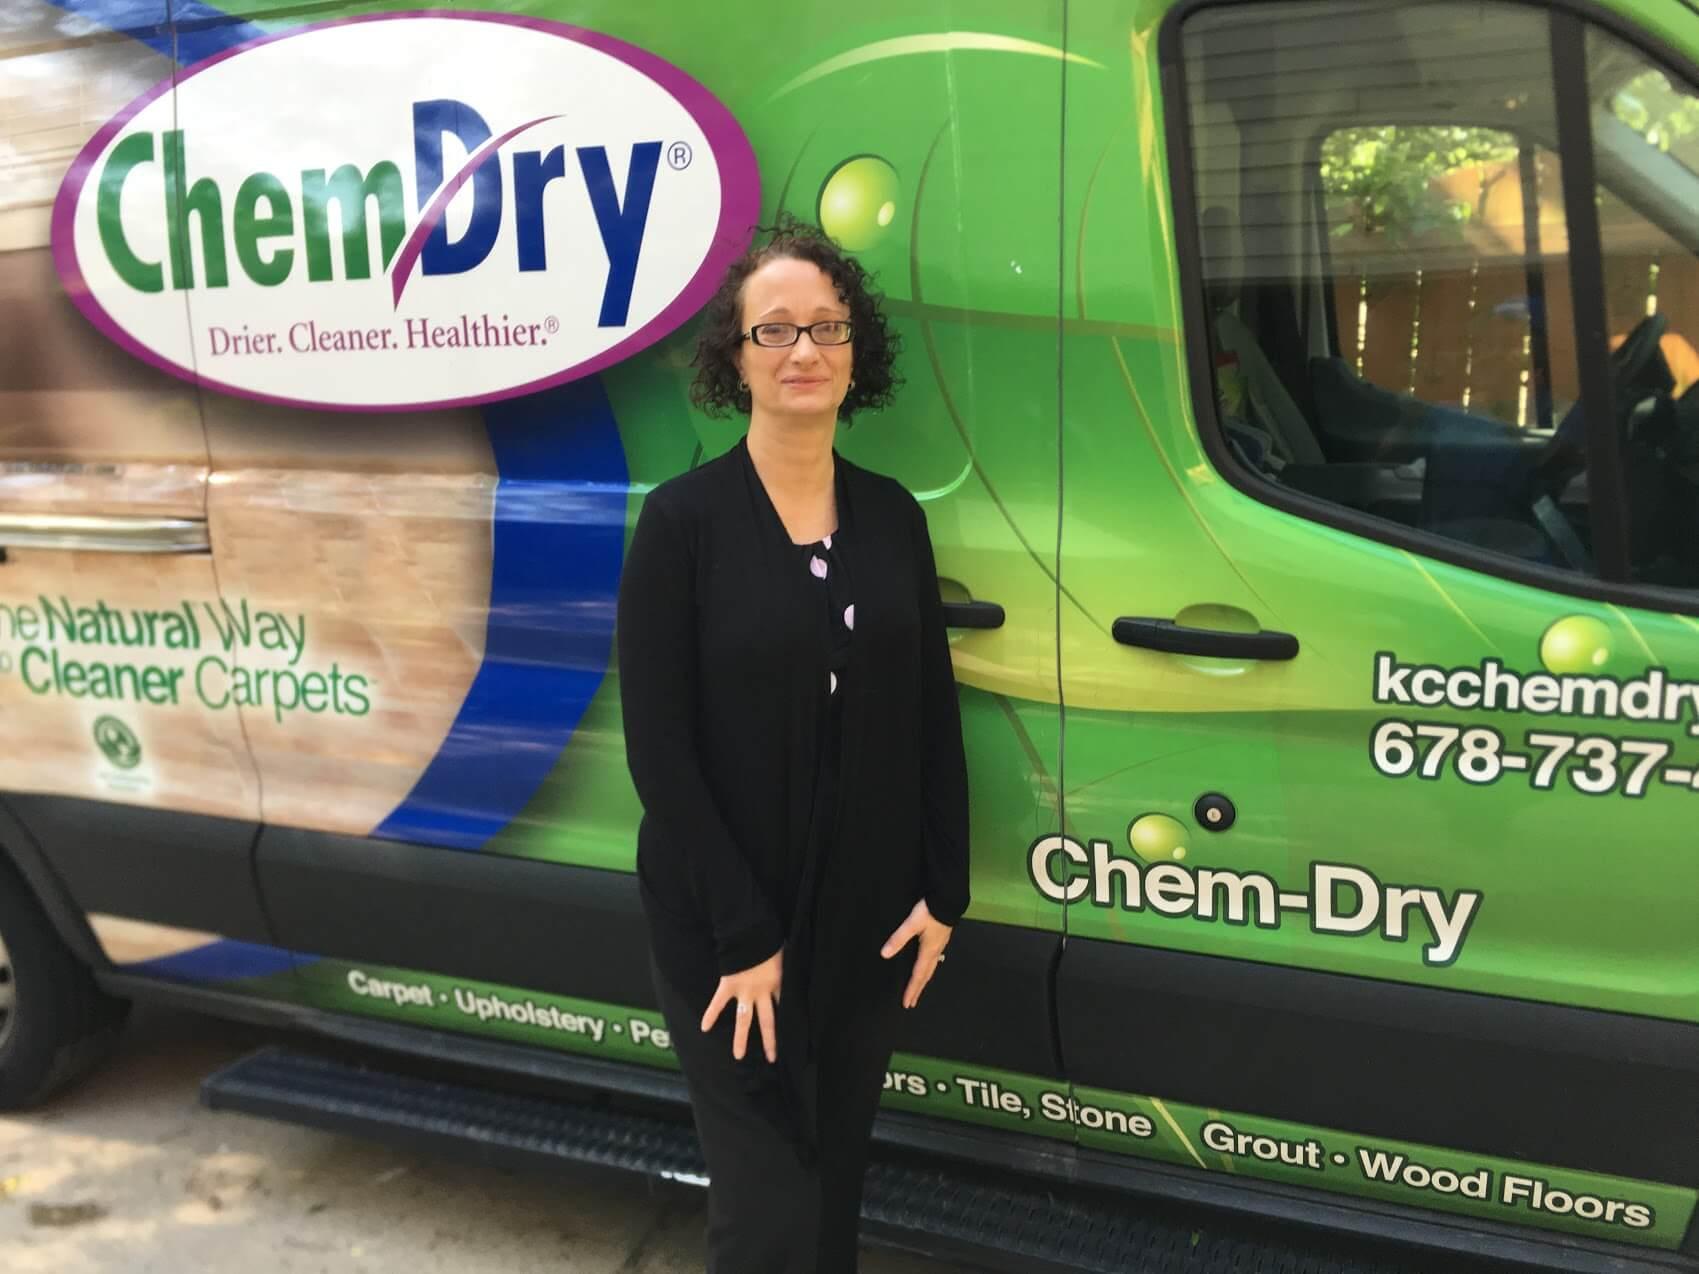 Tanja in front of green K&C Chem-Dry van